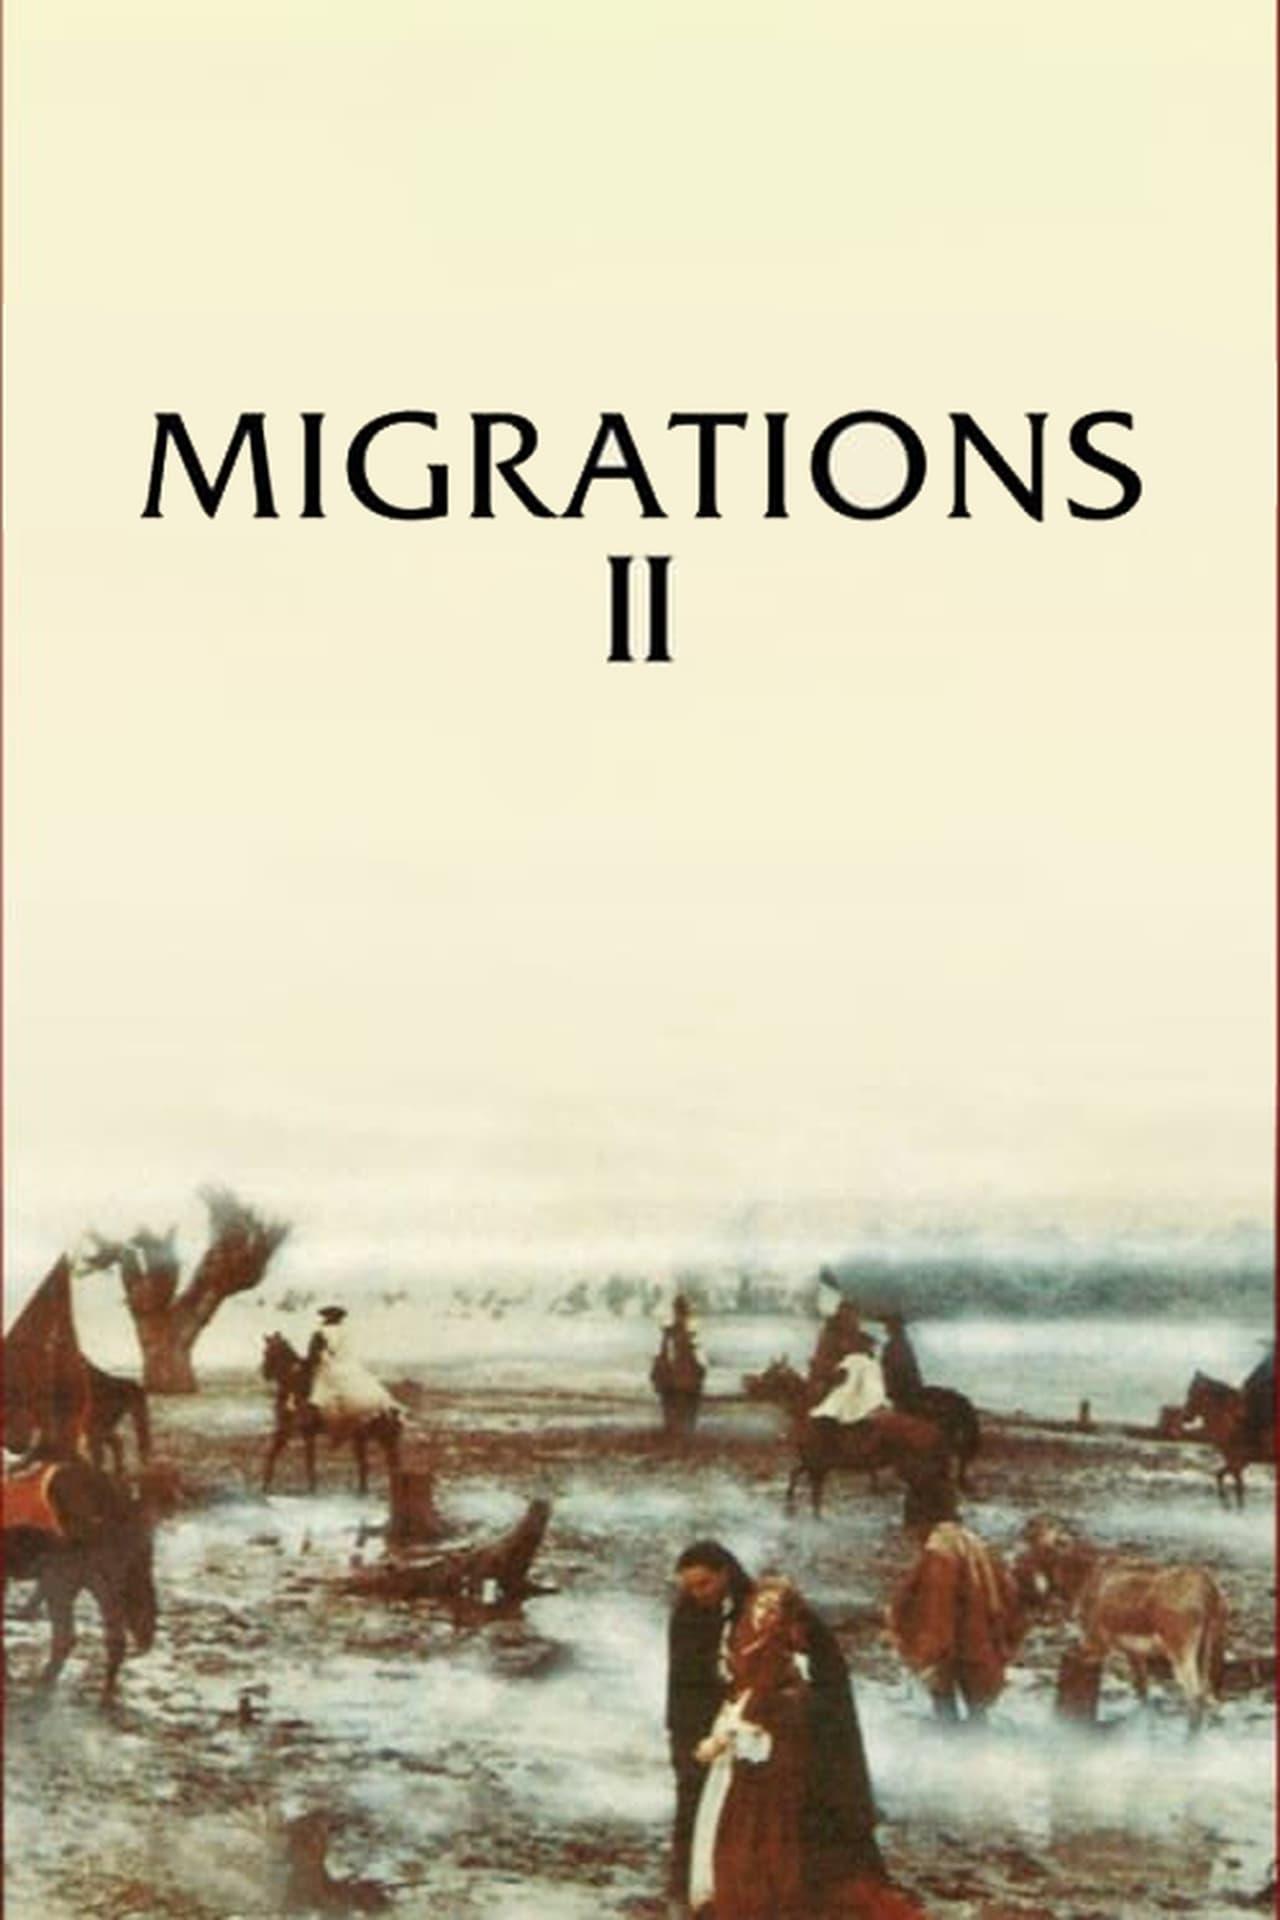 Migrations II